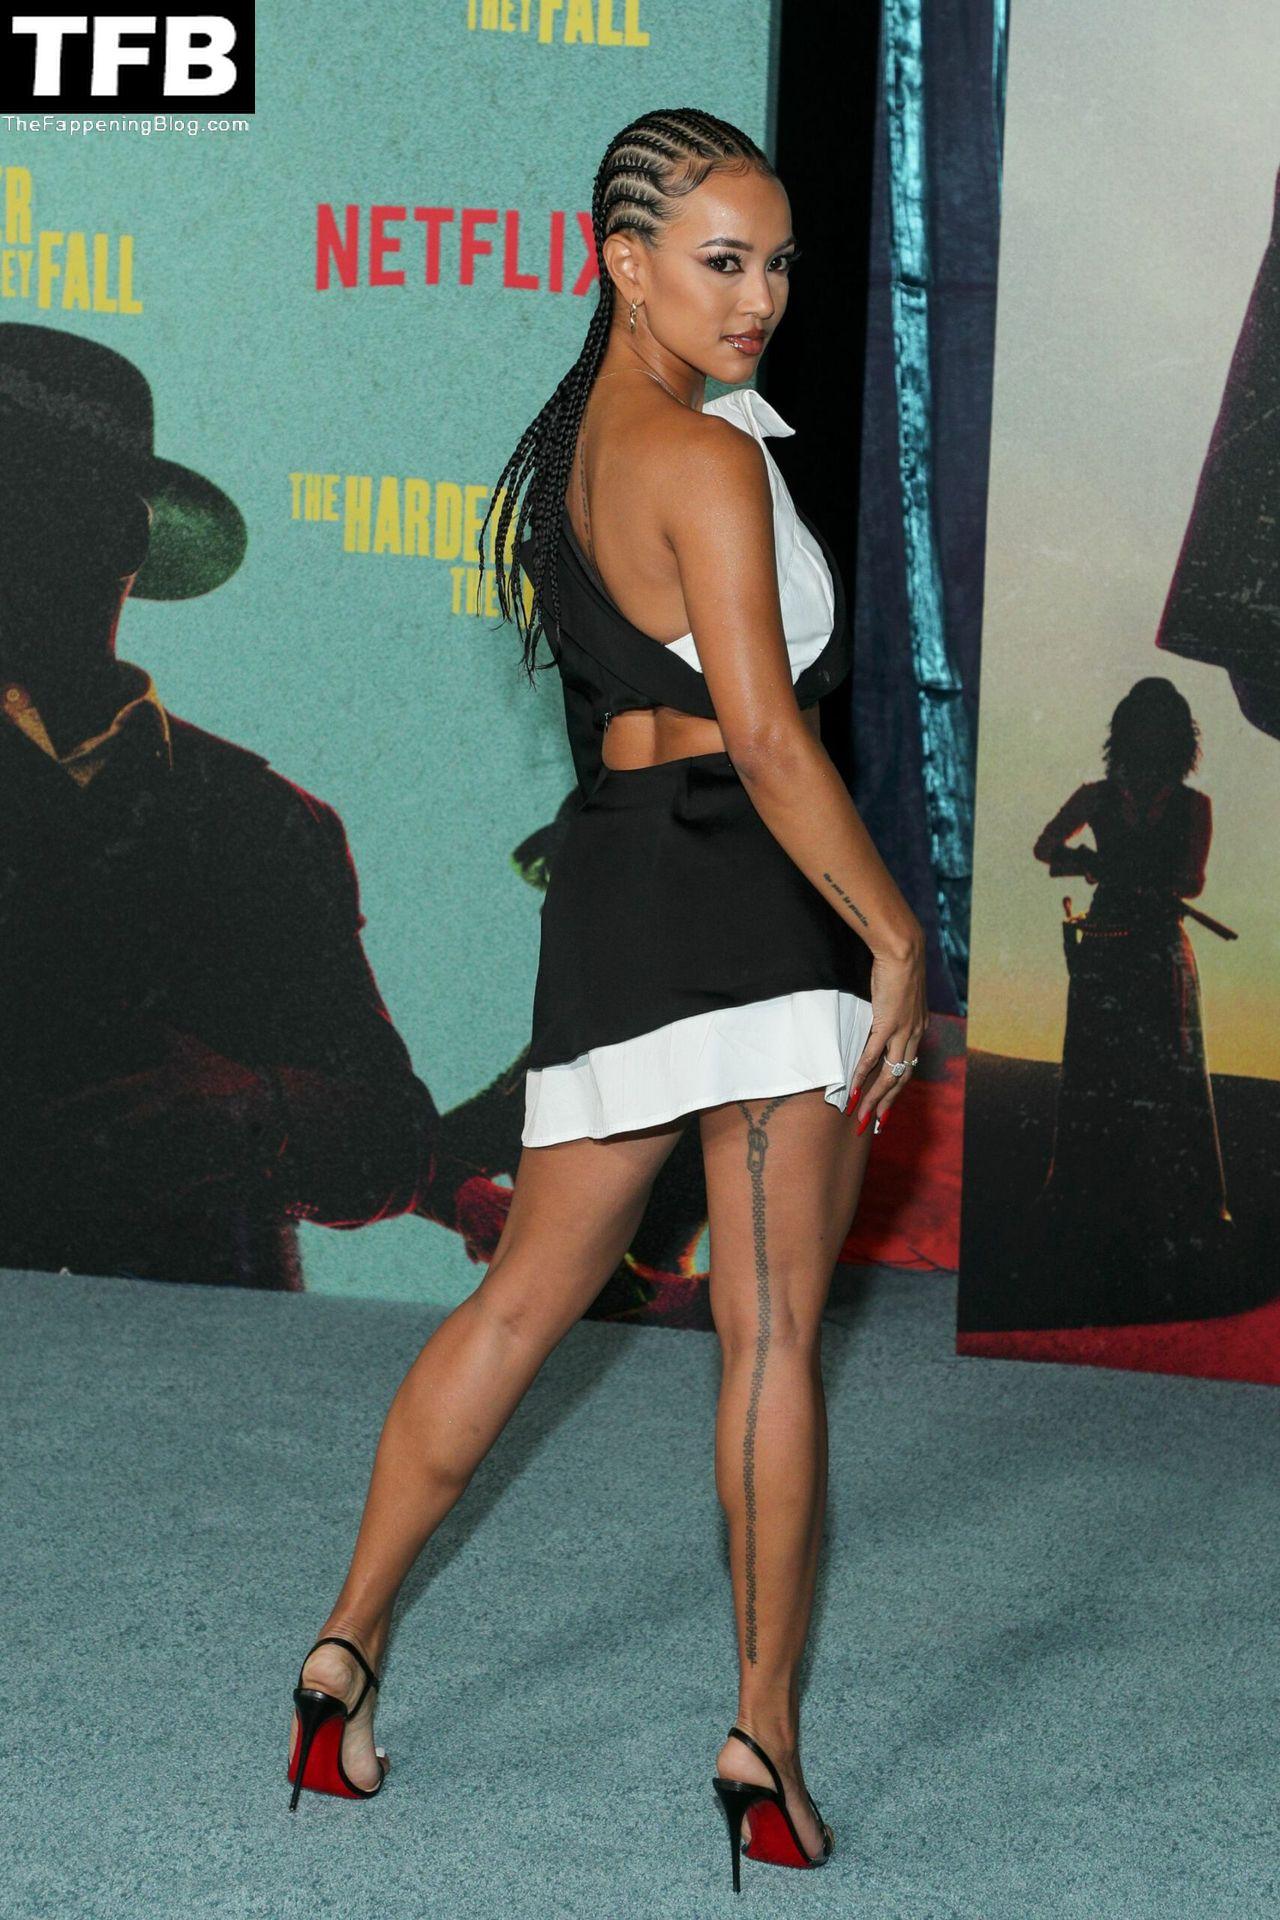 Karrueche-Tran-Sexy-Legs-Upskirt-The-Fappening-Blog-34.jpg